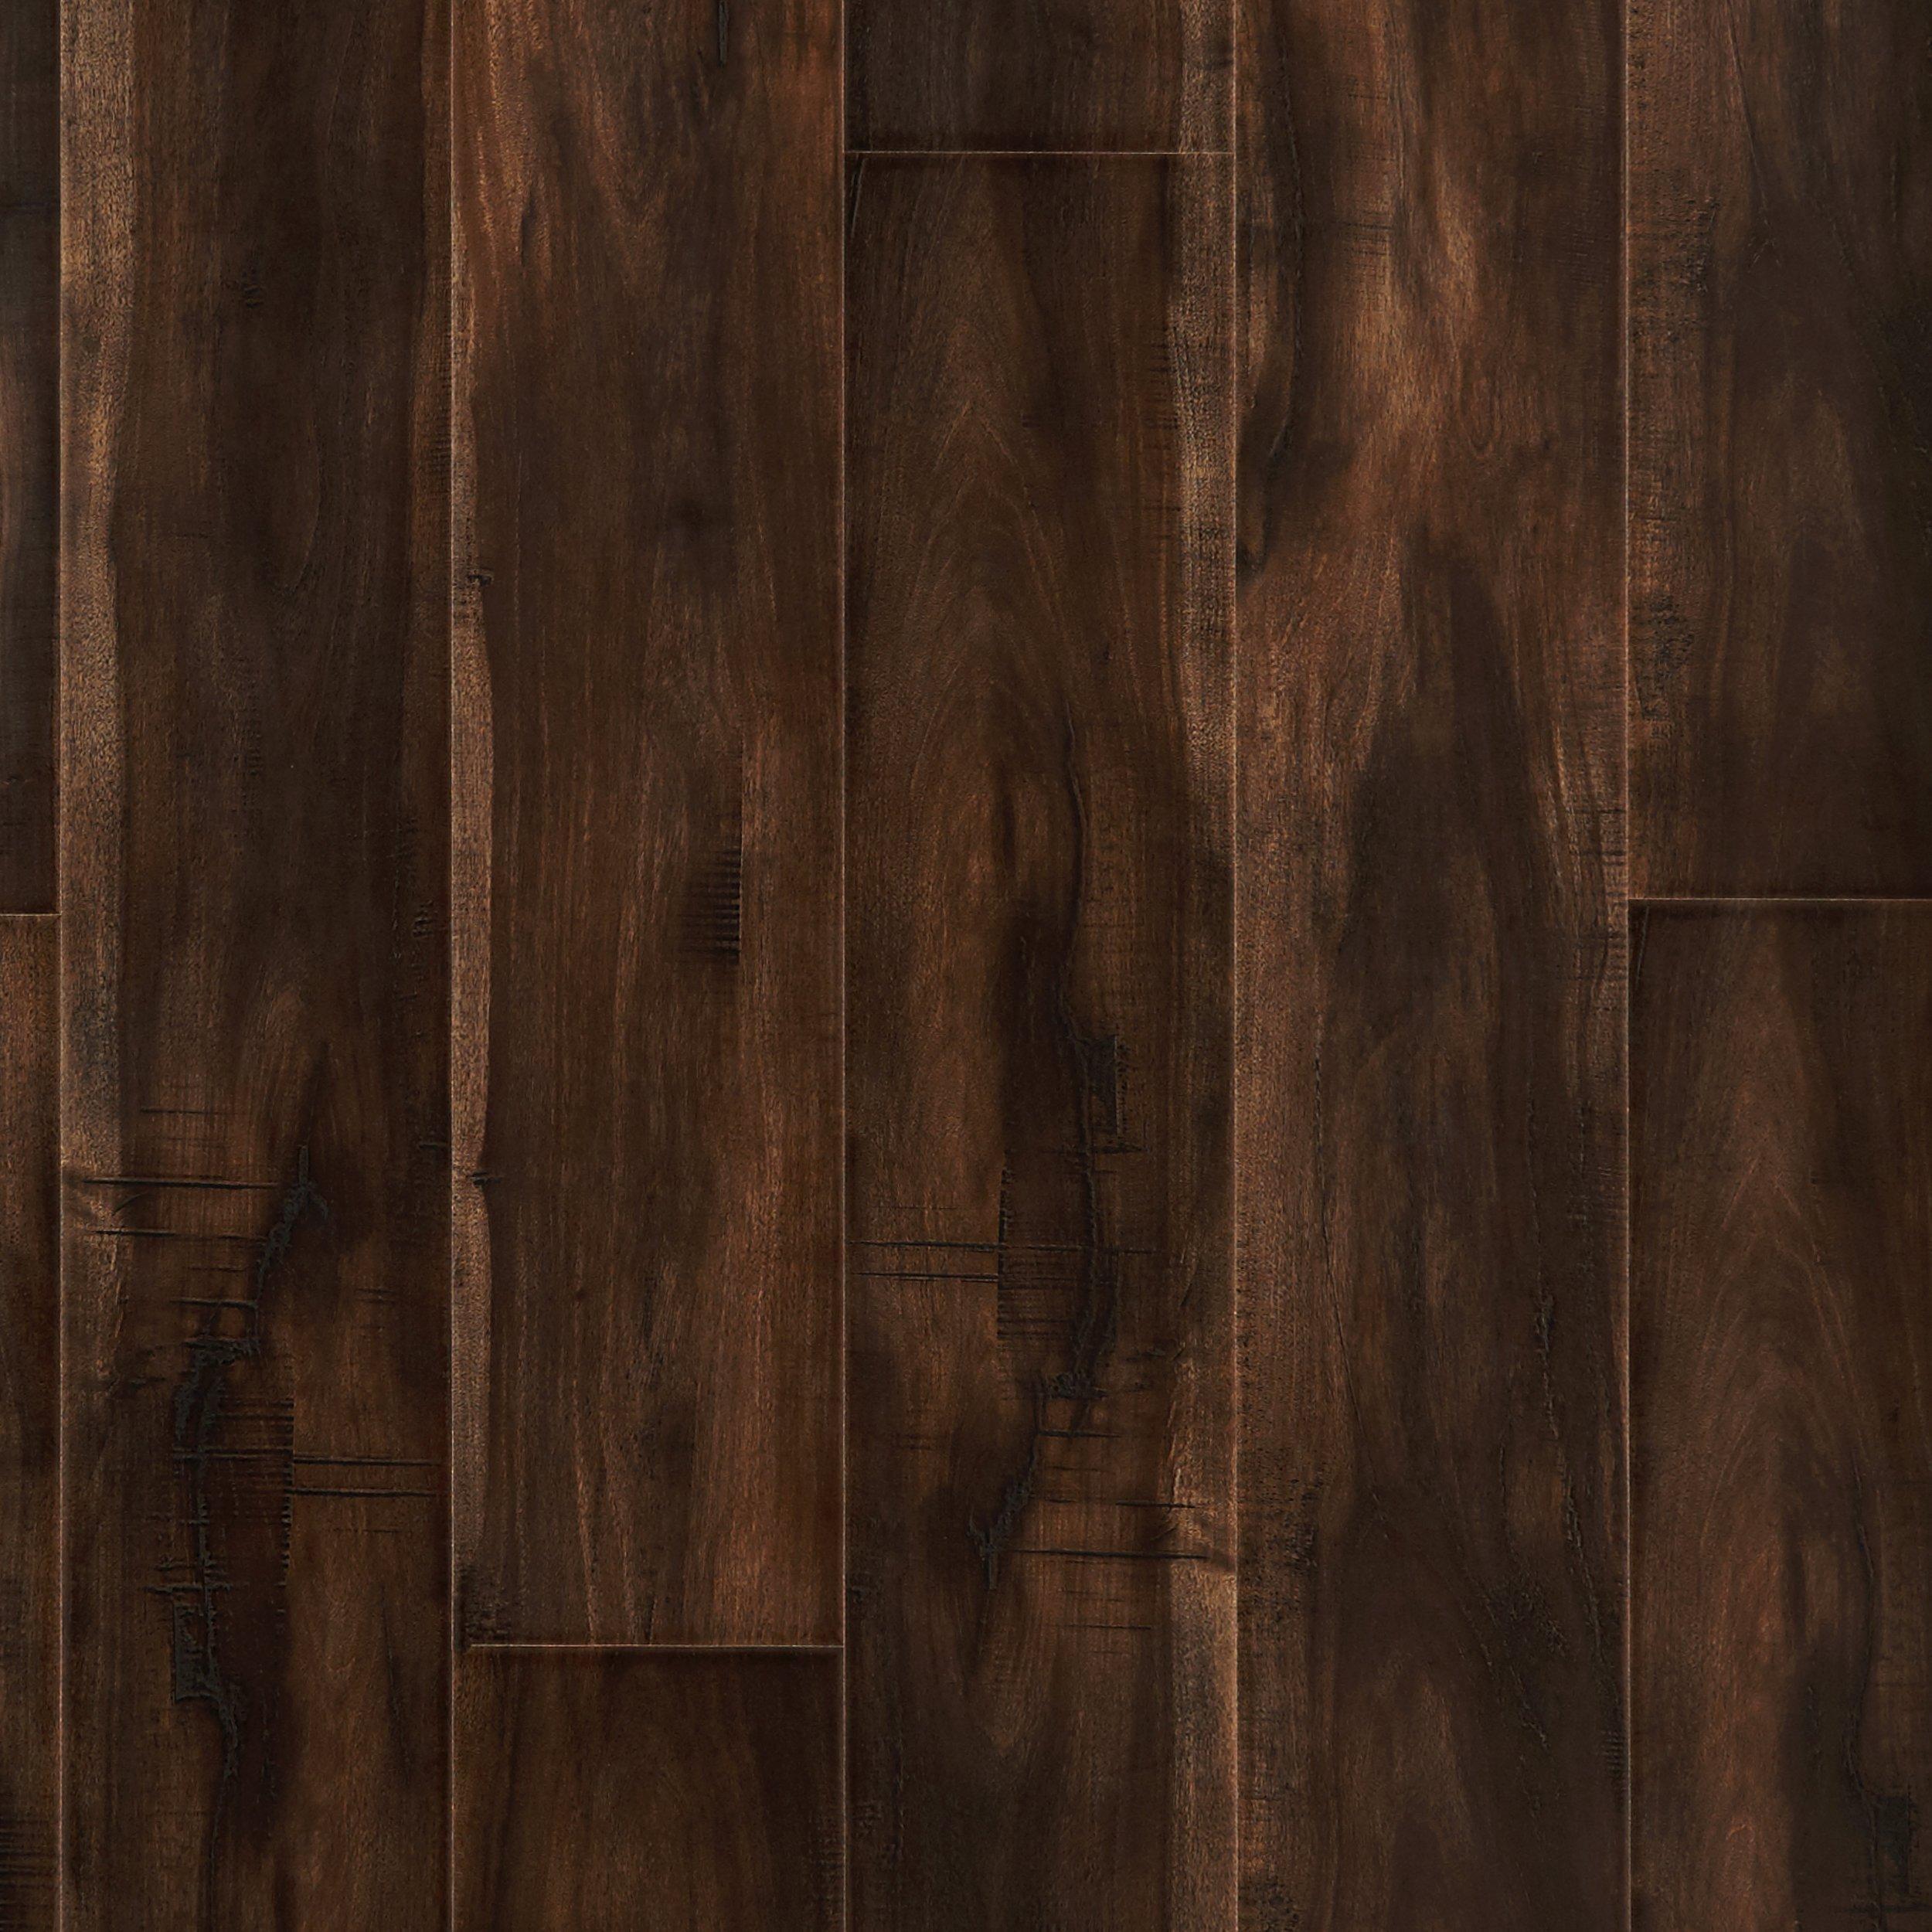 Coffee Maple Laminate 15mm 100085315 Floor and Decor